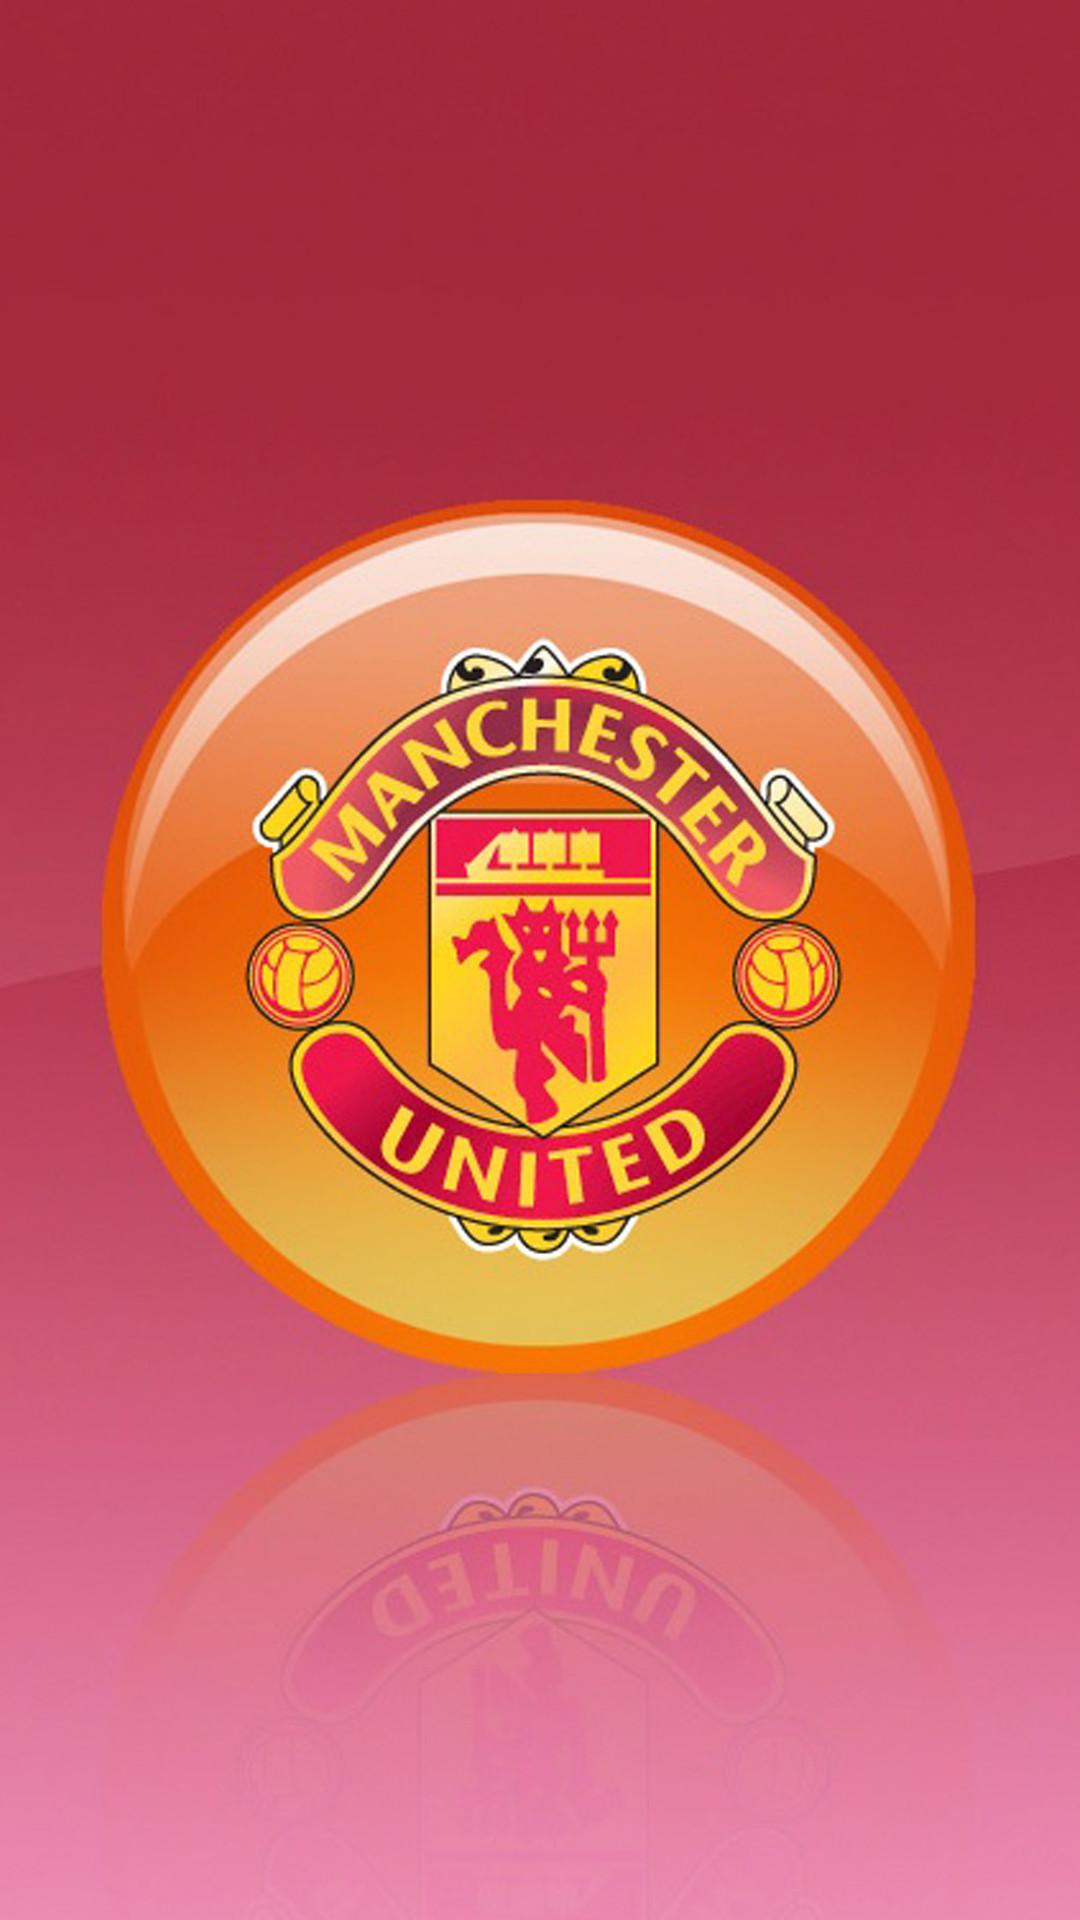 Apple iPhone 6 Plus HD Wallpaper – Manchester United Logo in 3D  #appleiphone6plus #appleiphone6wallpaper